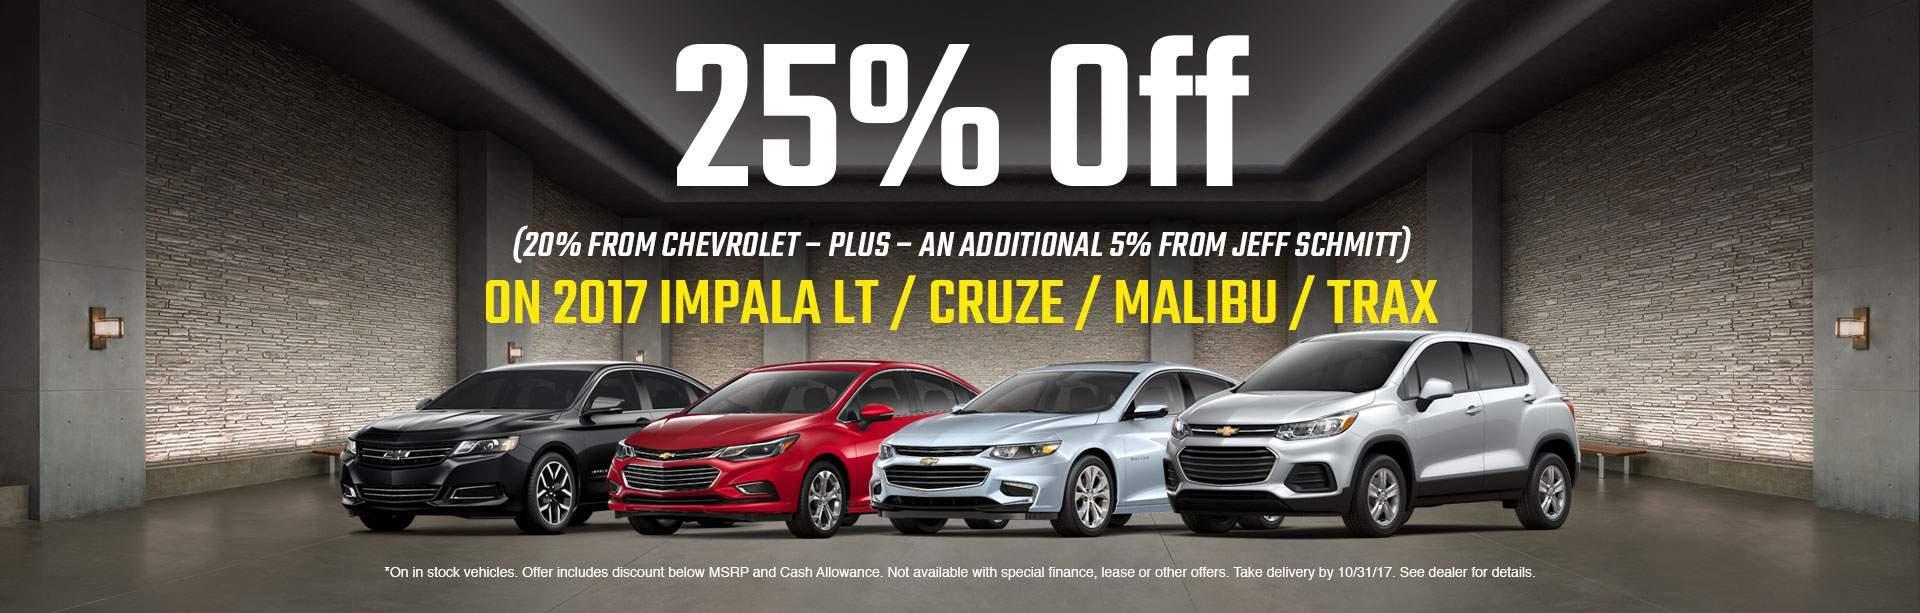 Chevrolet dealership dayton oh used cars jeff schmitt chevy east